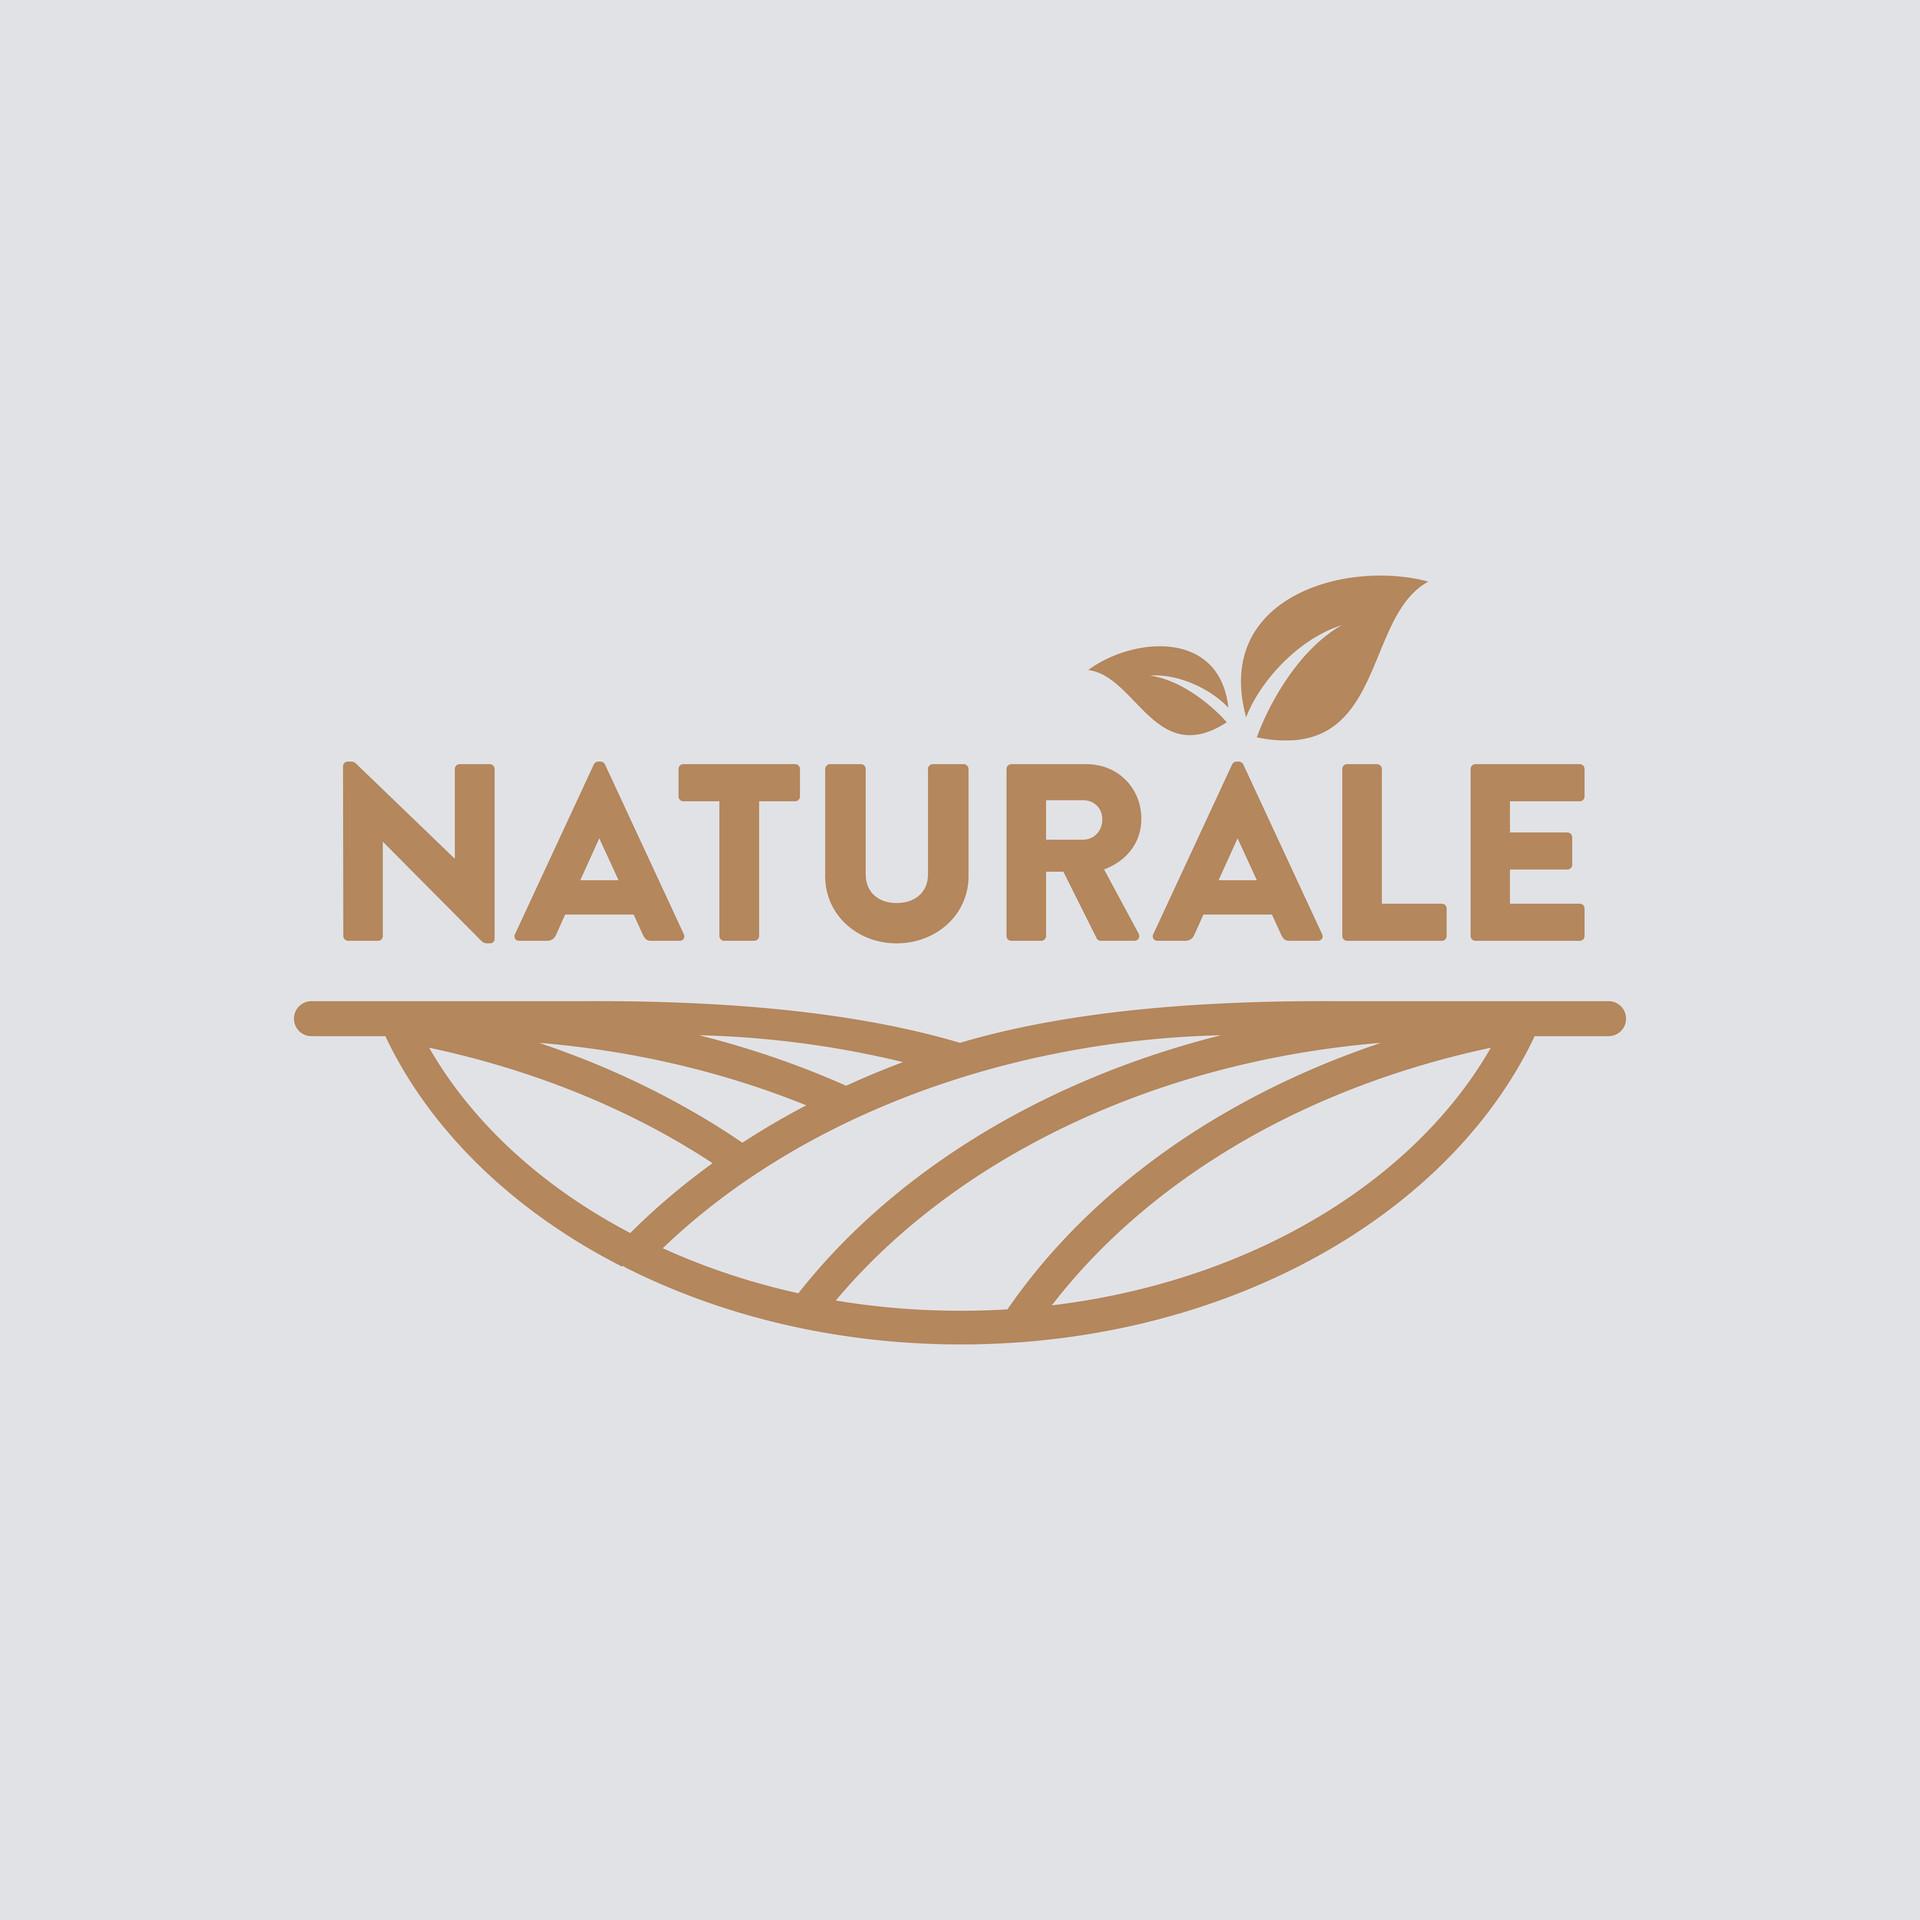 Naturale_Logo.jpg